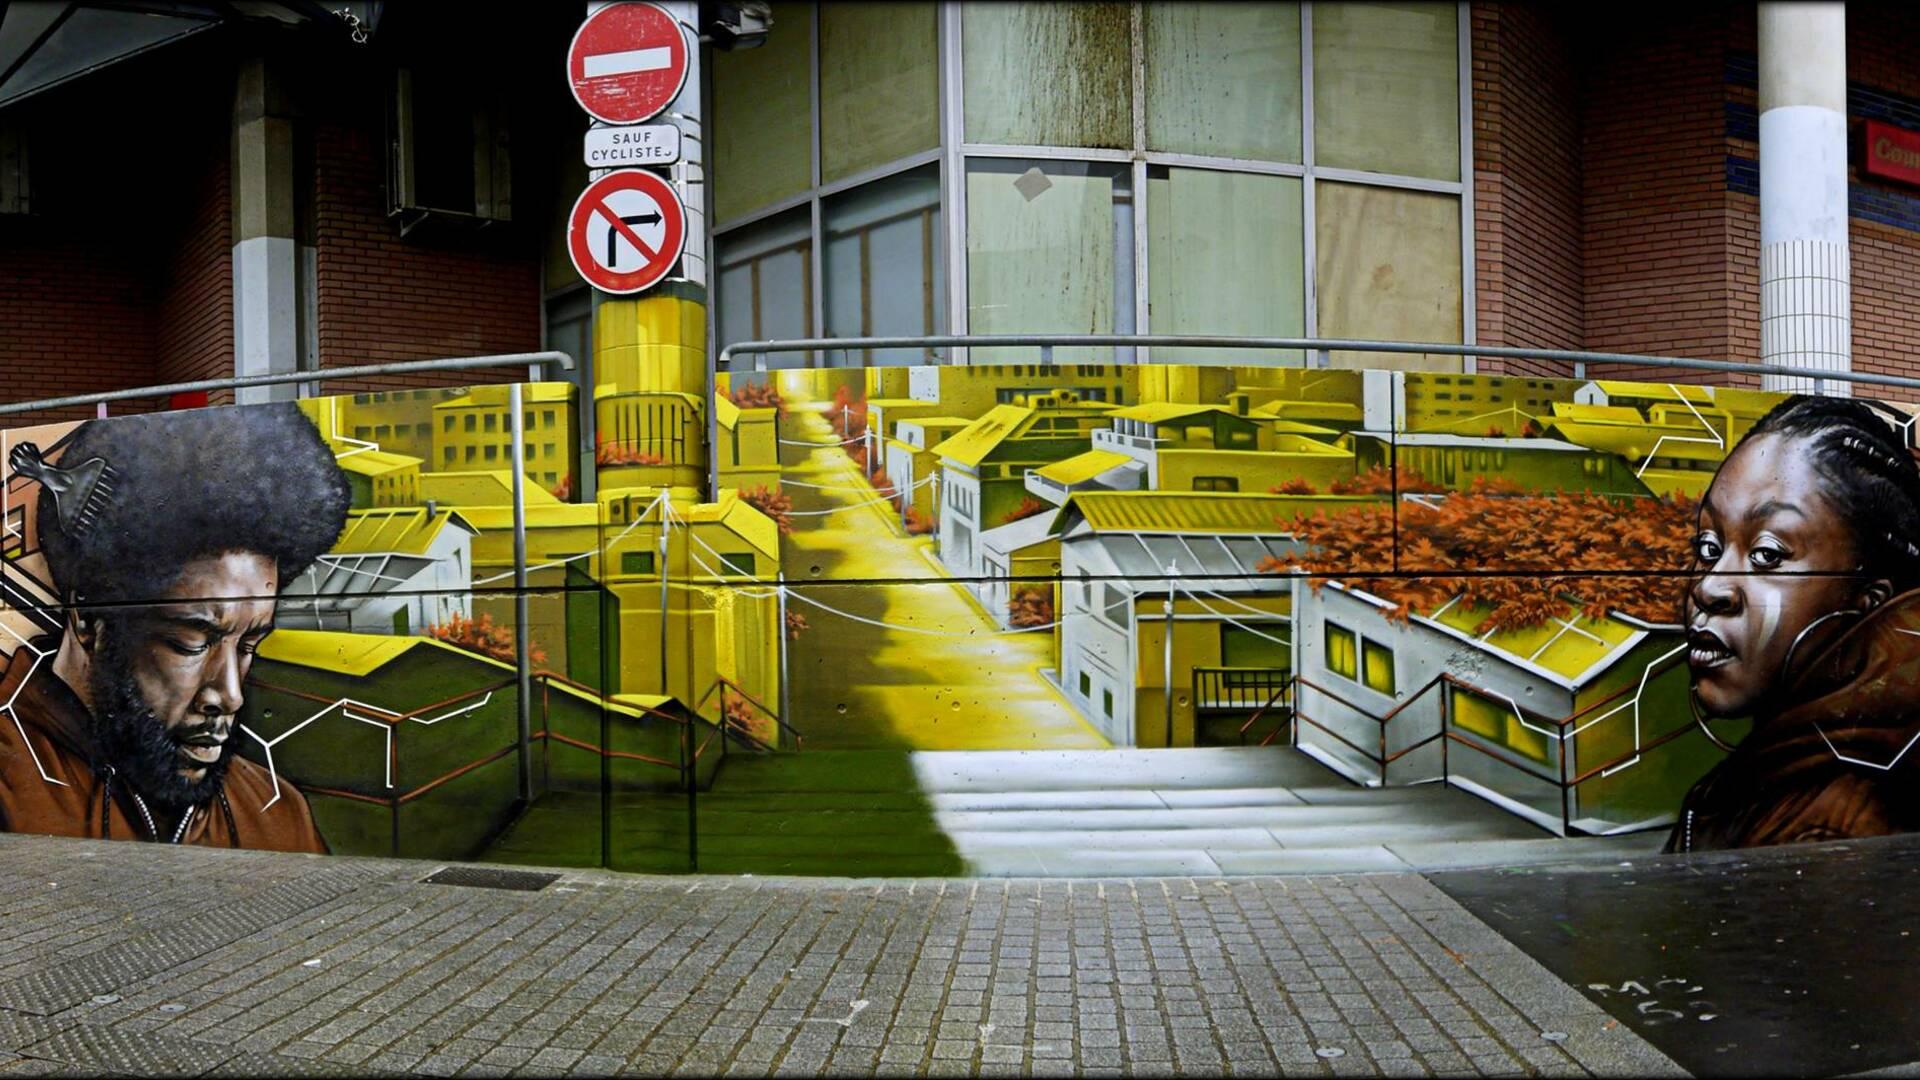 manyak-berthet-one-brok-seyb-emoy-mur-93-saint-denis-street-art-art-urbain